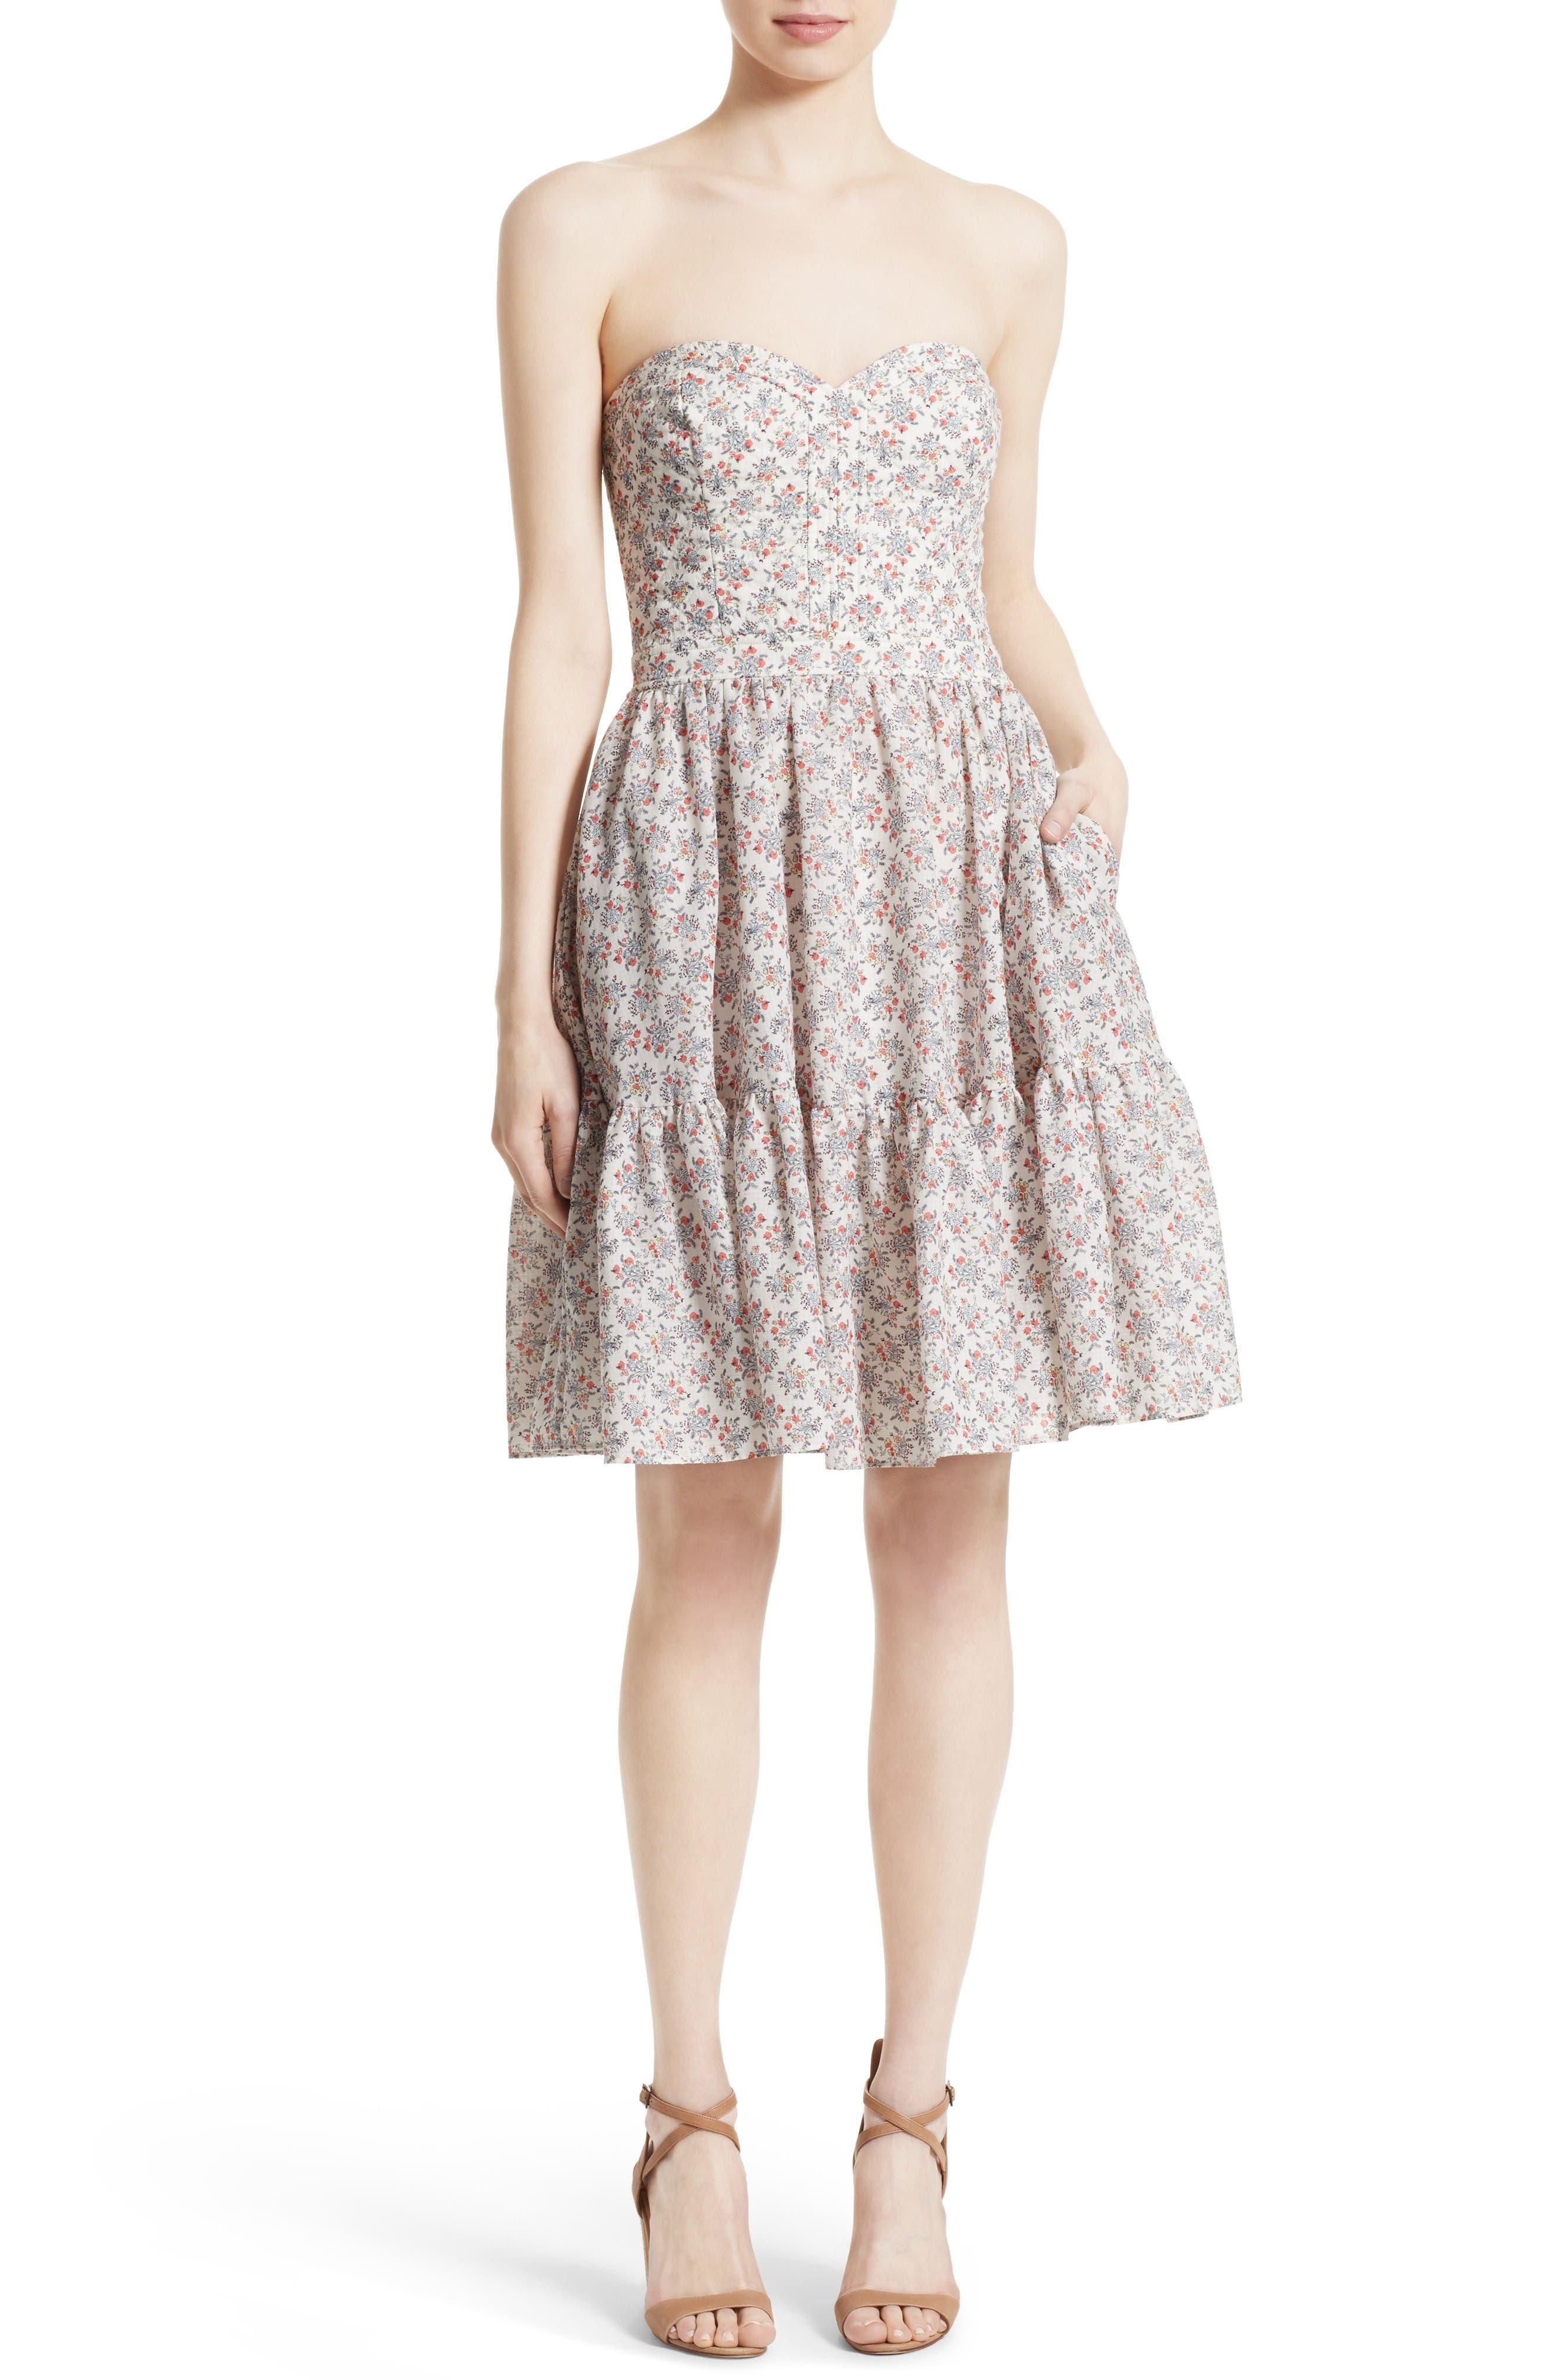 La Vie Rebecca Taylor Provençal Strapless Dress